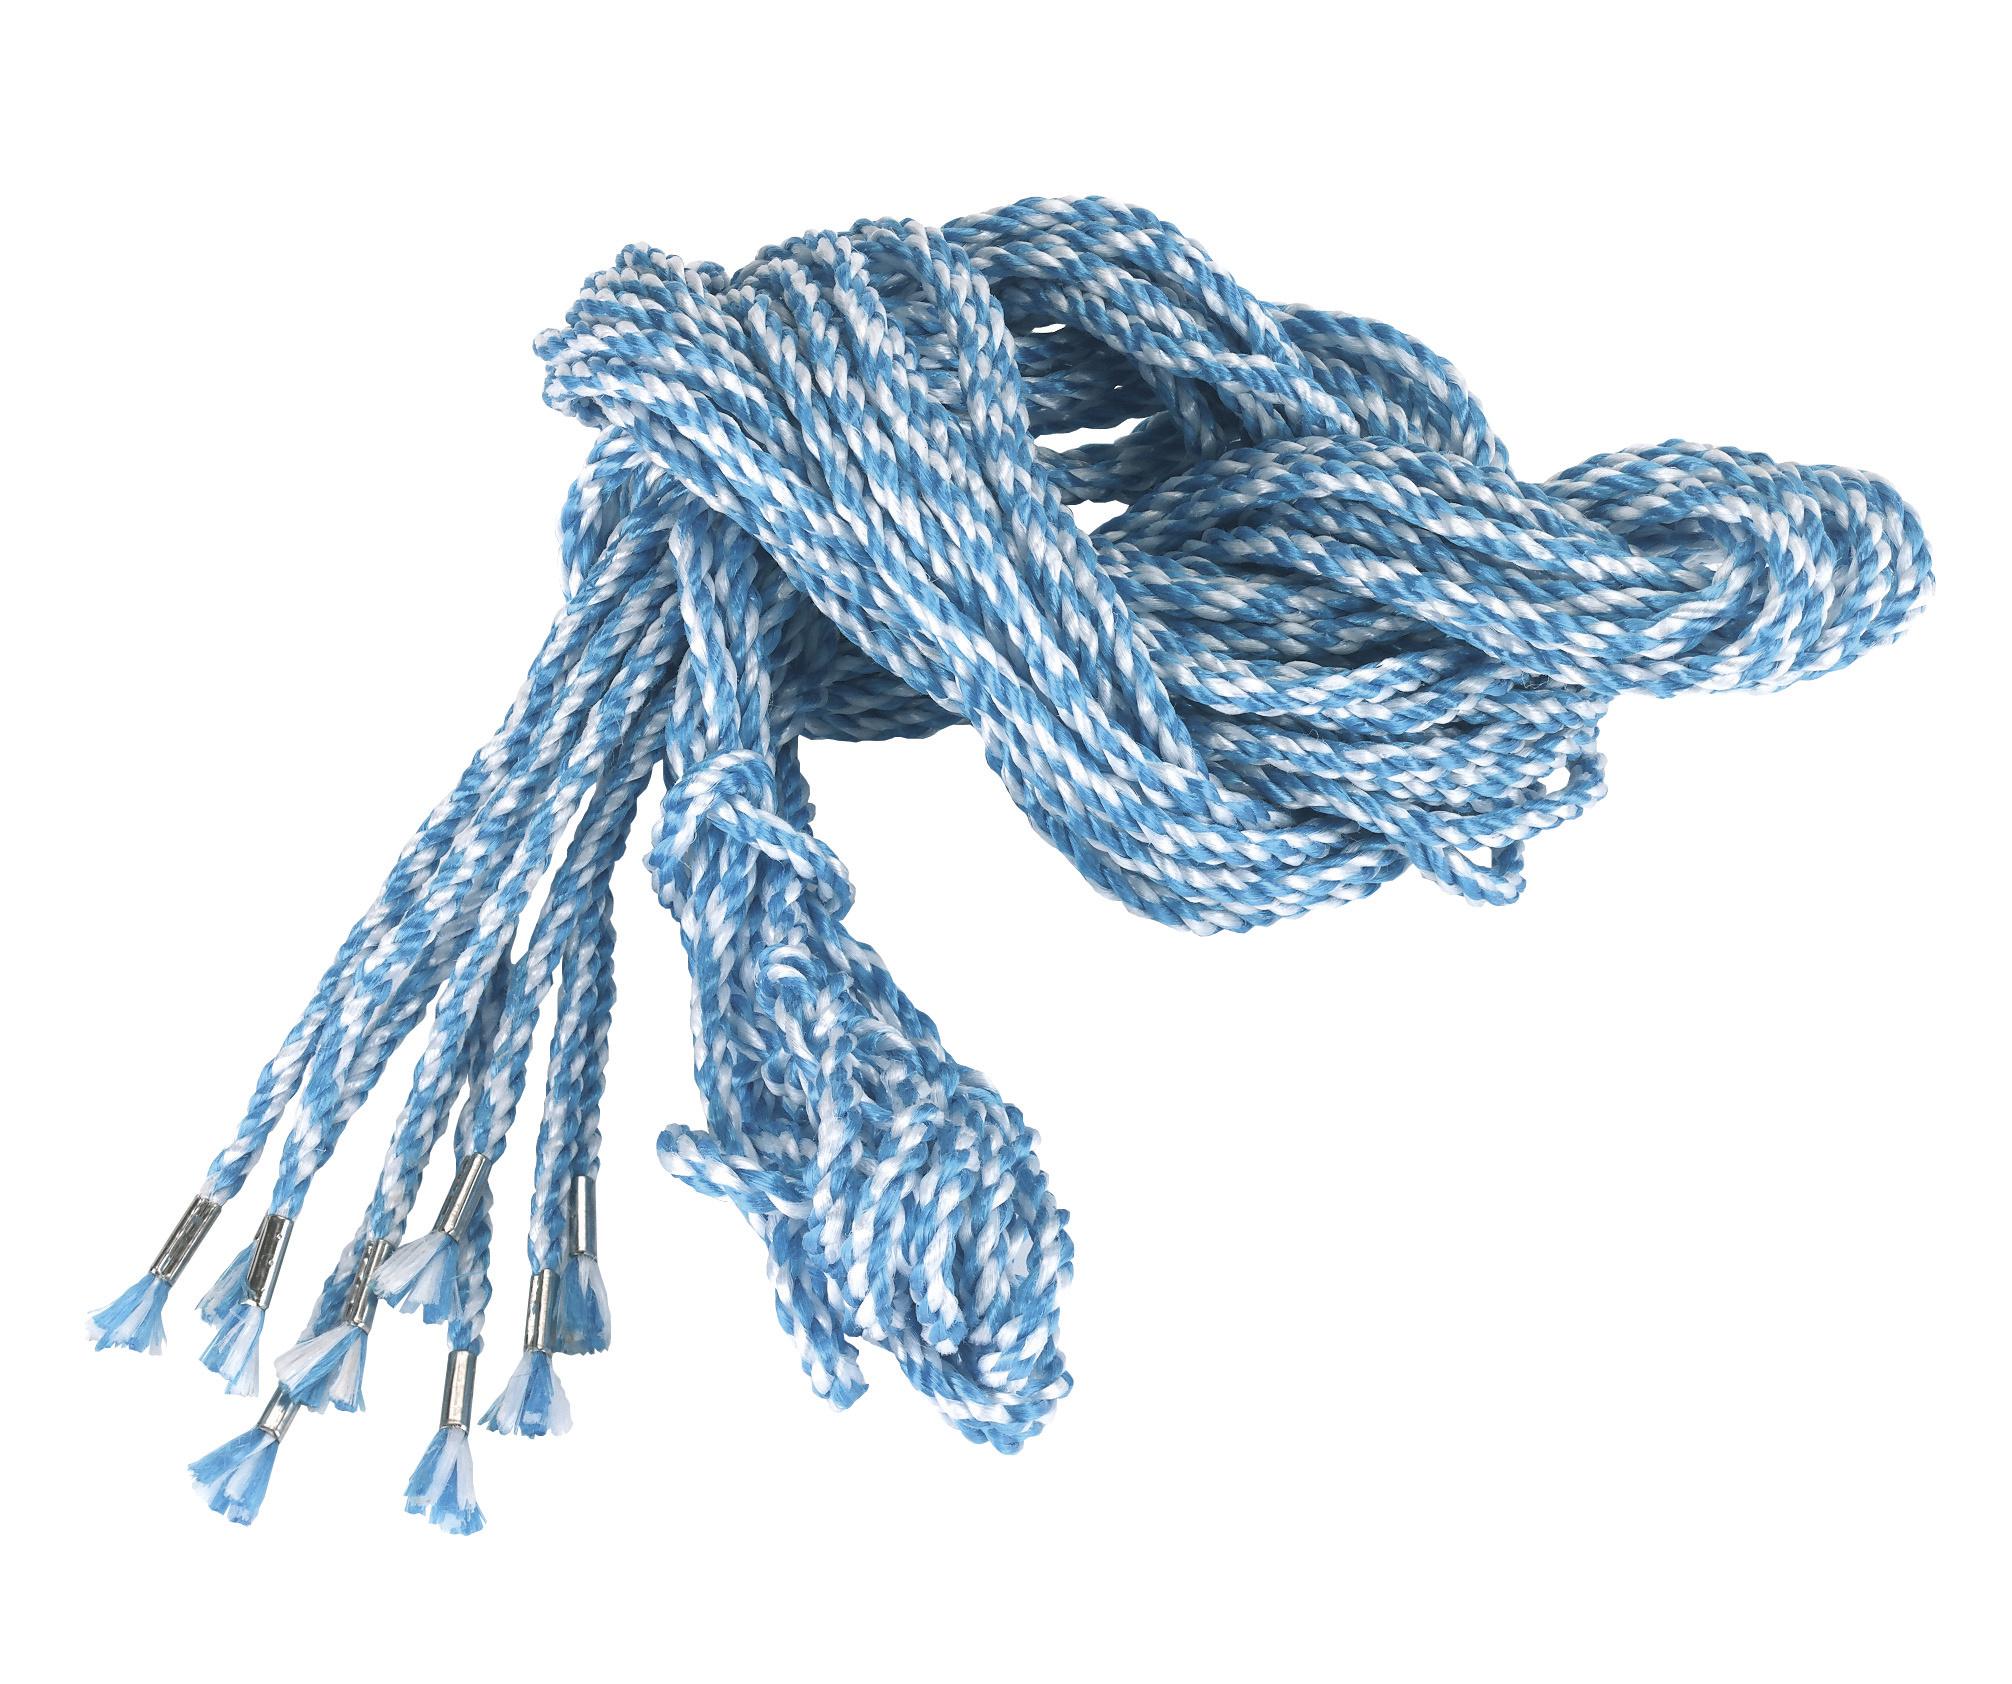 Gerüststrick  10-er Pack blau-weiß 2,5 m  -- 8mm stark